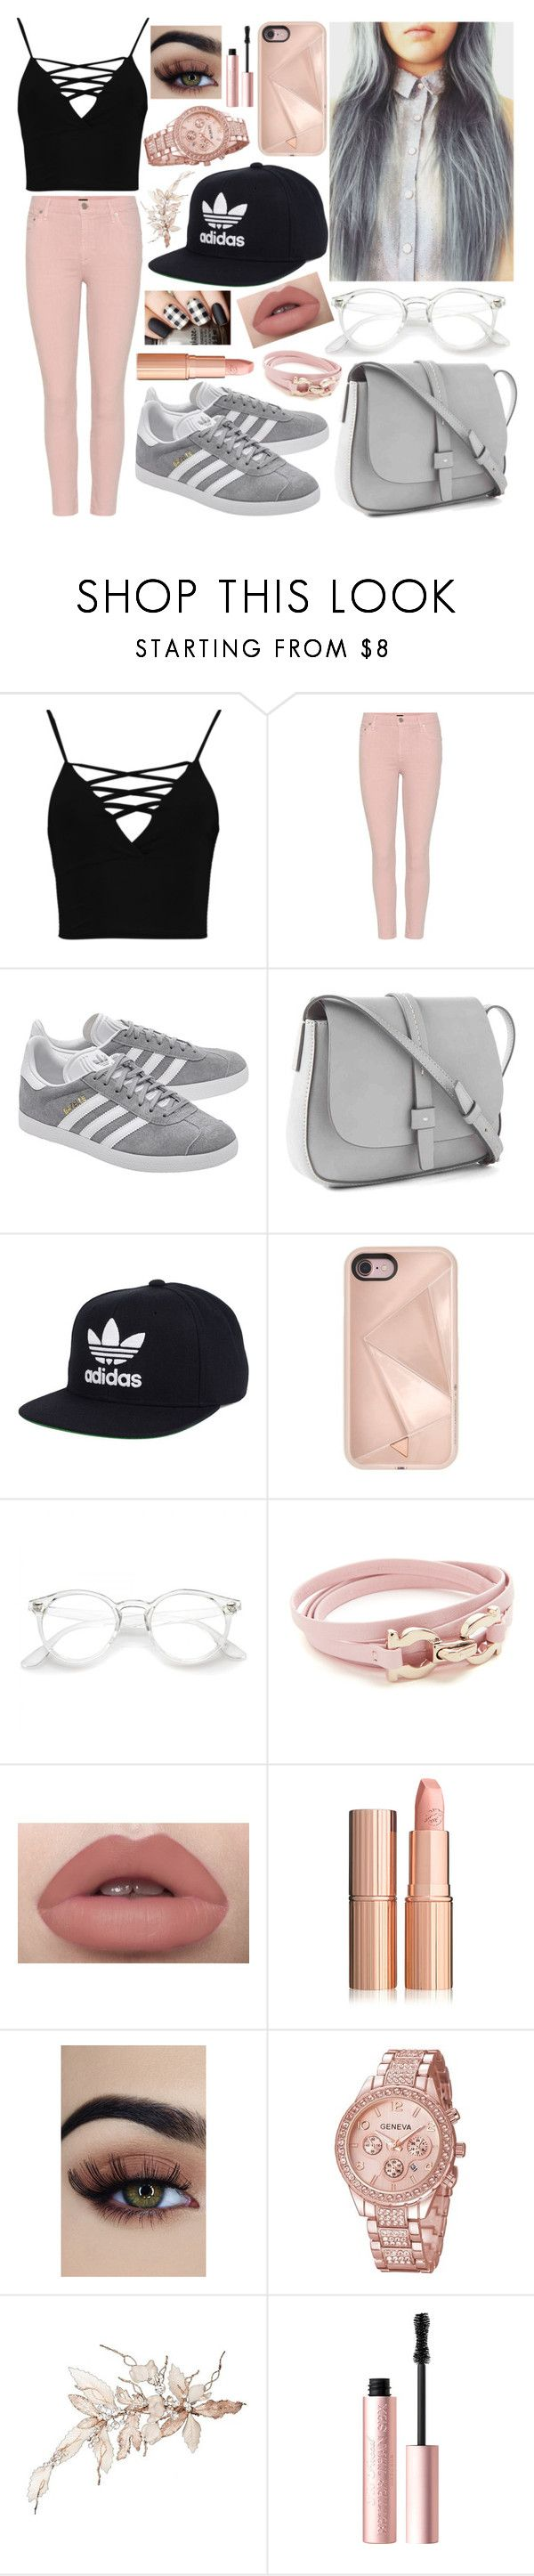 """ADIDAS"" by nirataa ❤ liked on Polyvore featuring Boohoo, Citizens of Humanity, adidas Originals, Gap, adidas, Rebecca Minkoff, Salvatore Ferragamo and Too Faced Cosmetics"